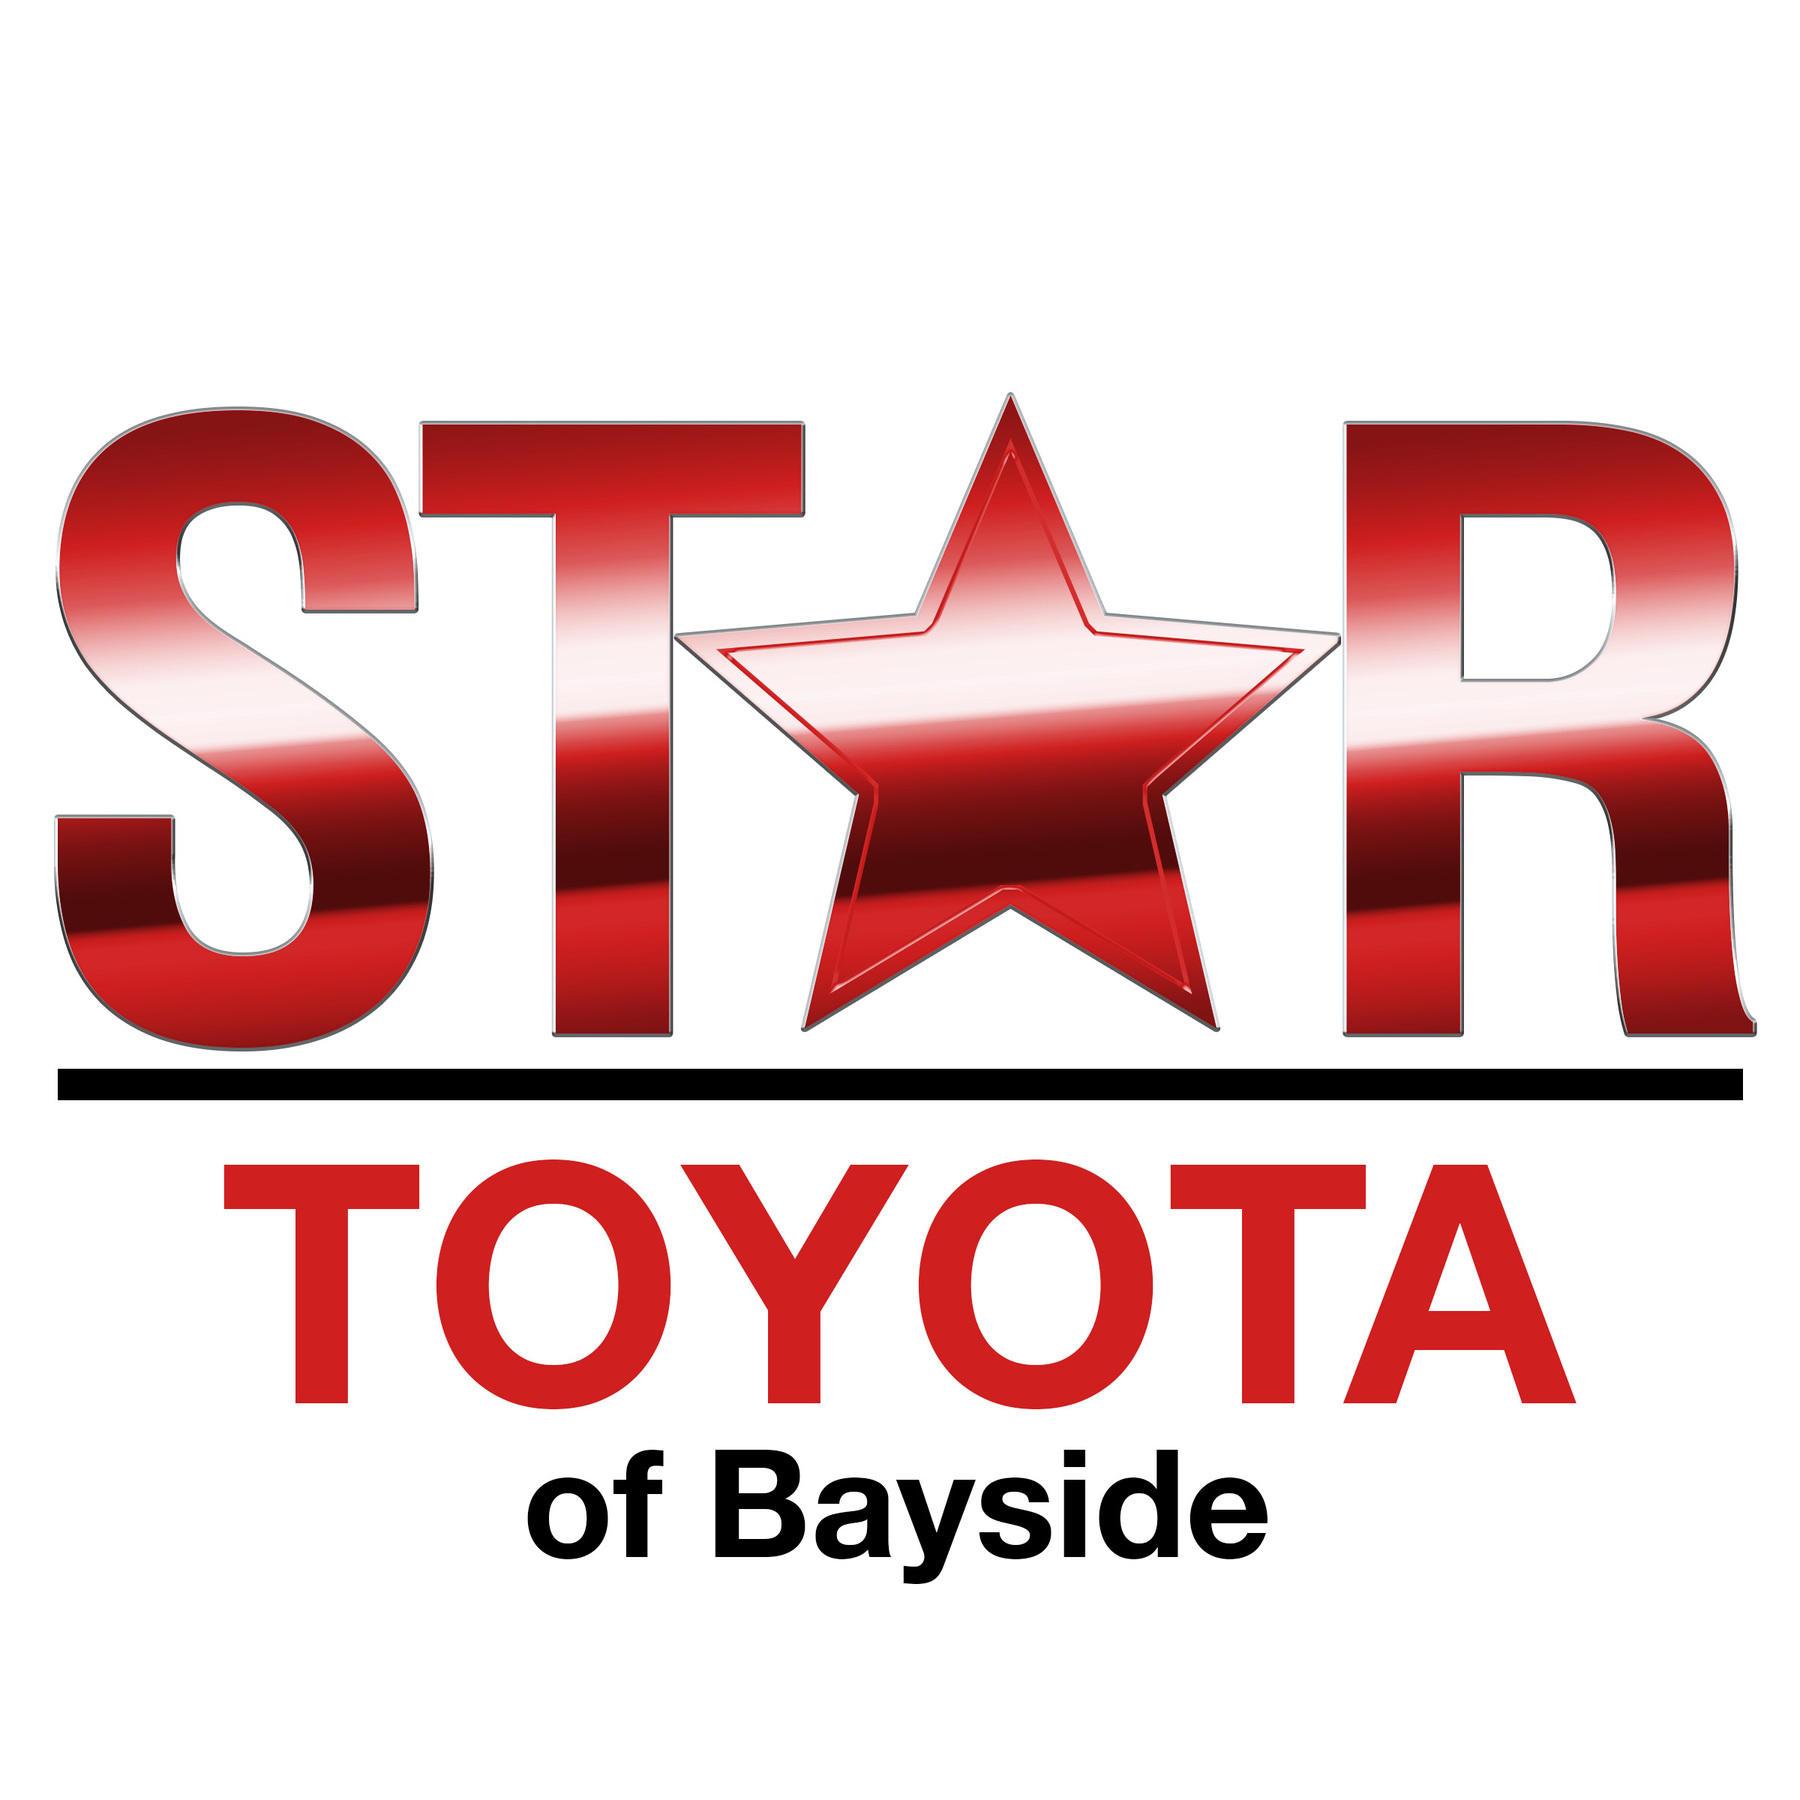 Star Toyota of Bayside